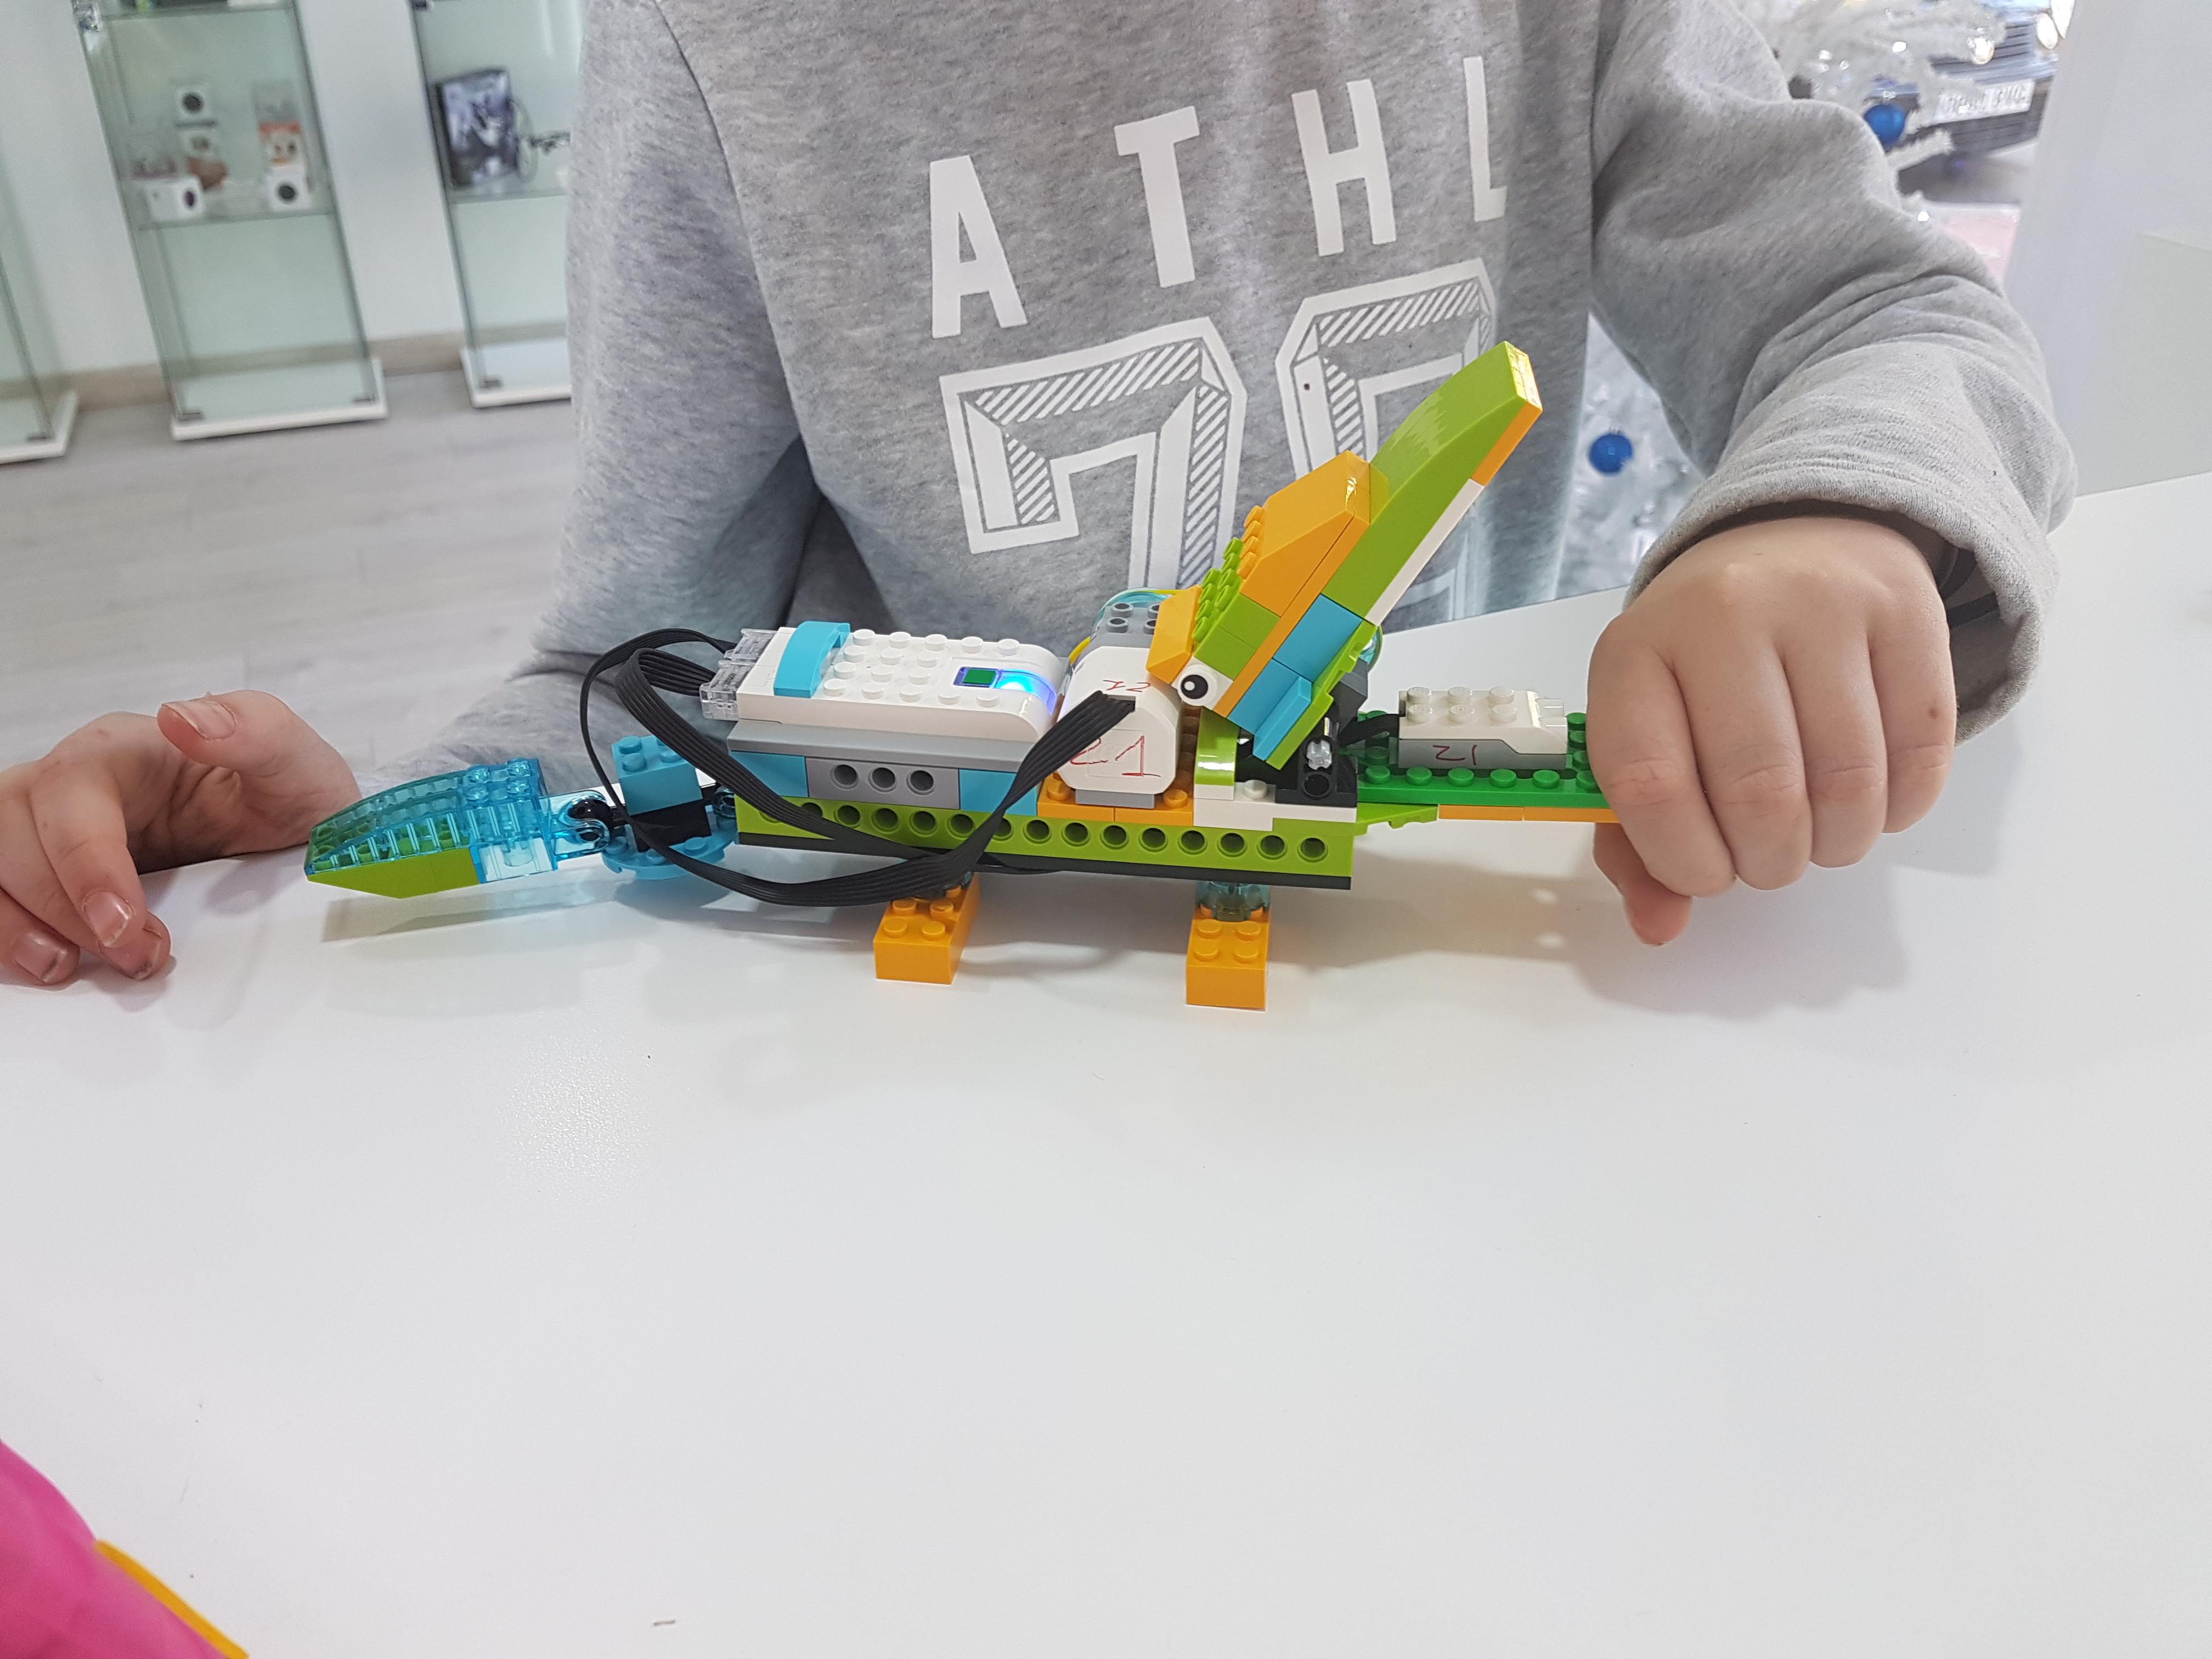 Robótica educativa Lego